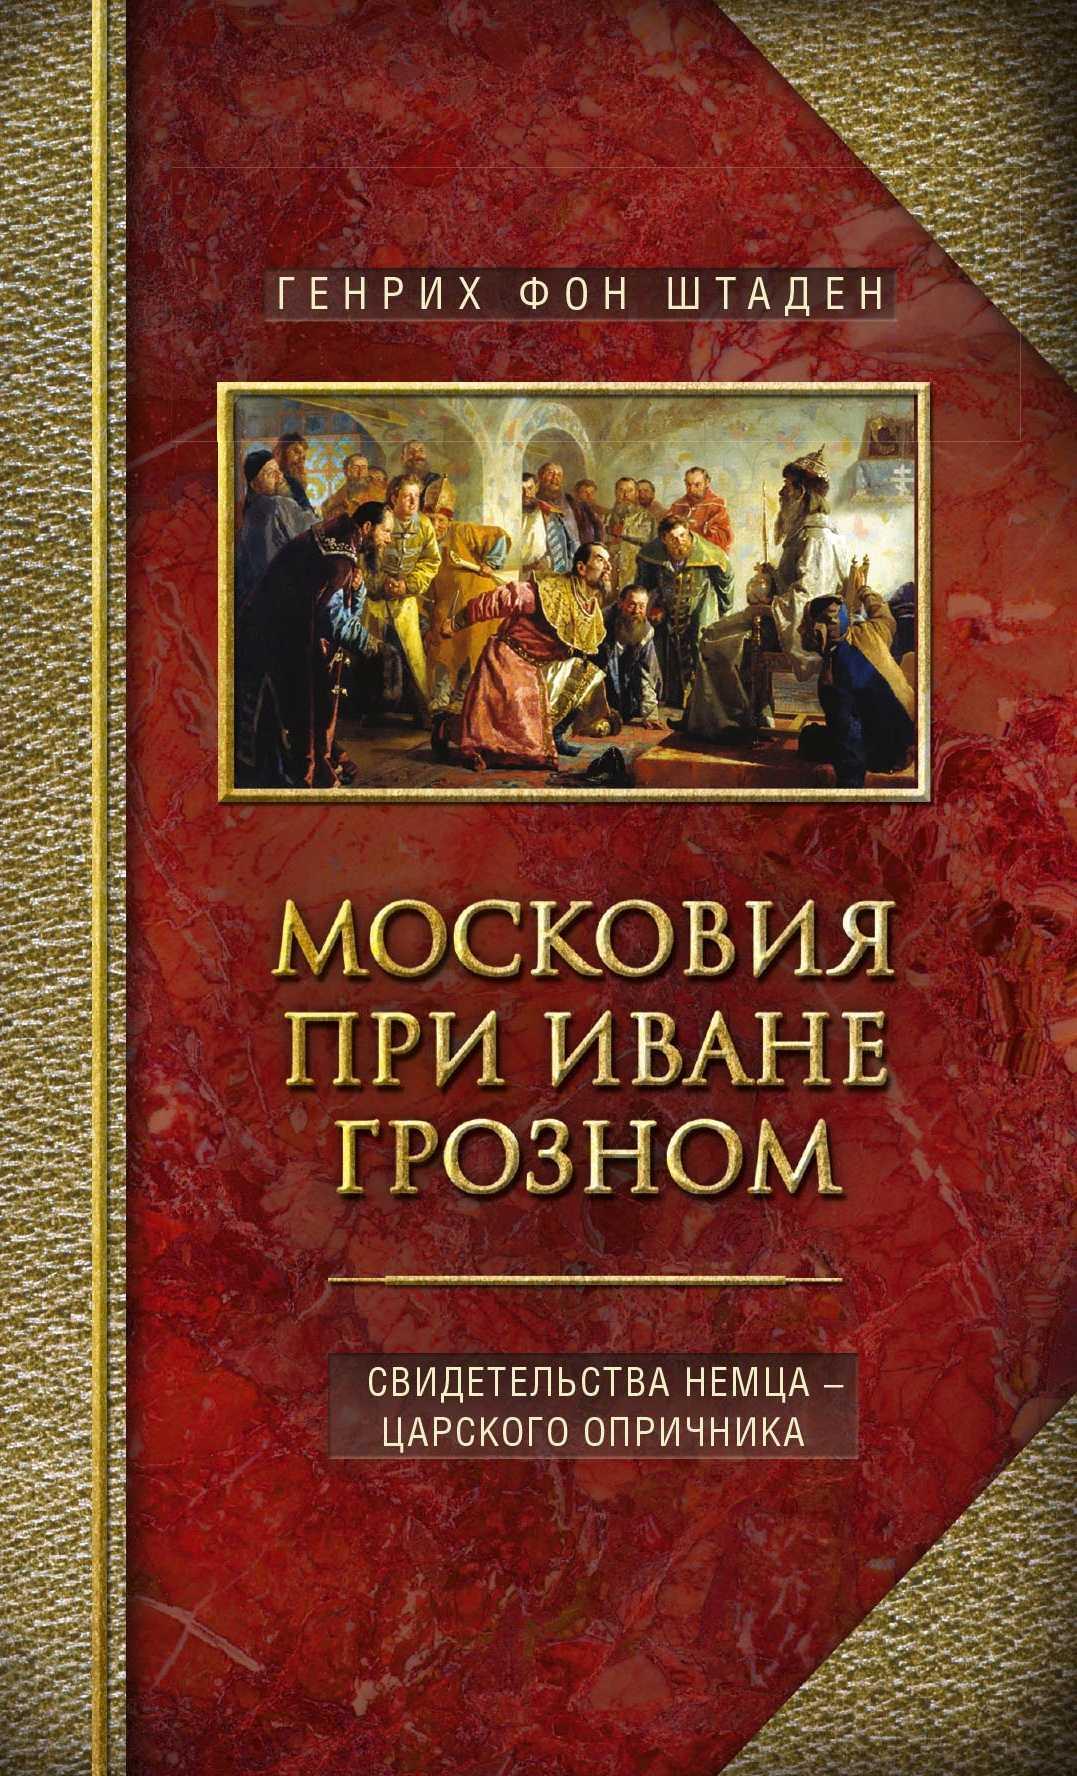 Московия при Иване Грозном. Свидетельства немца – царского опричника